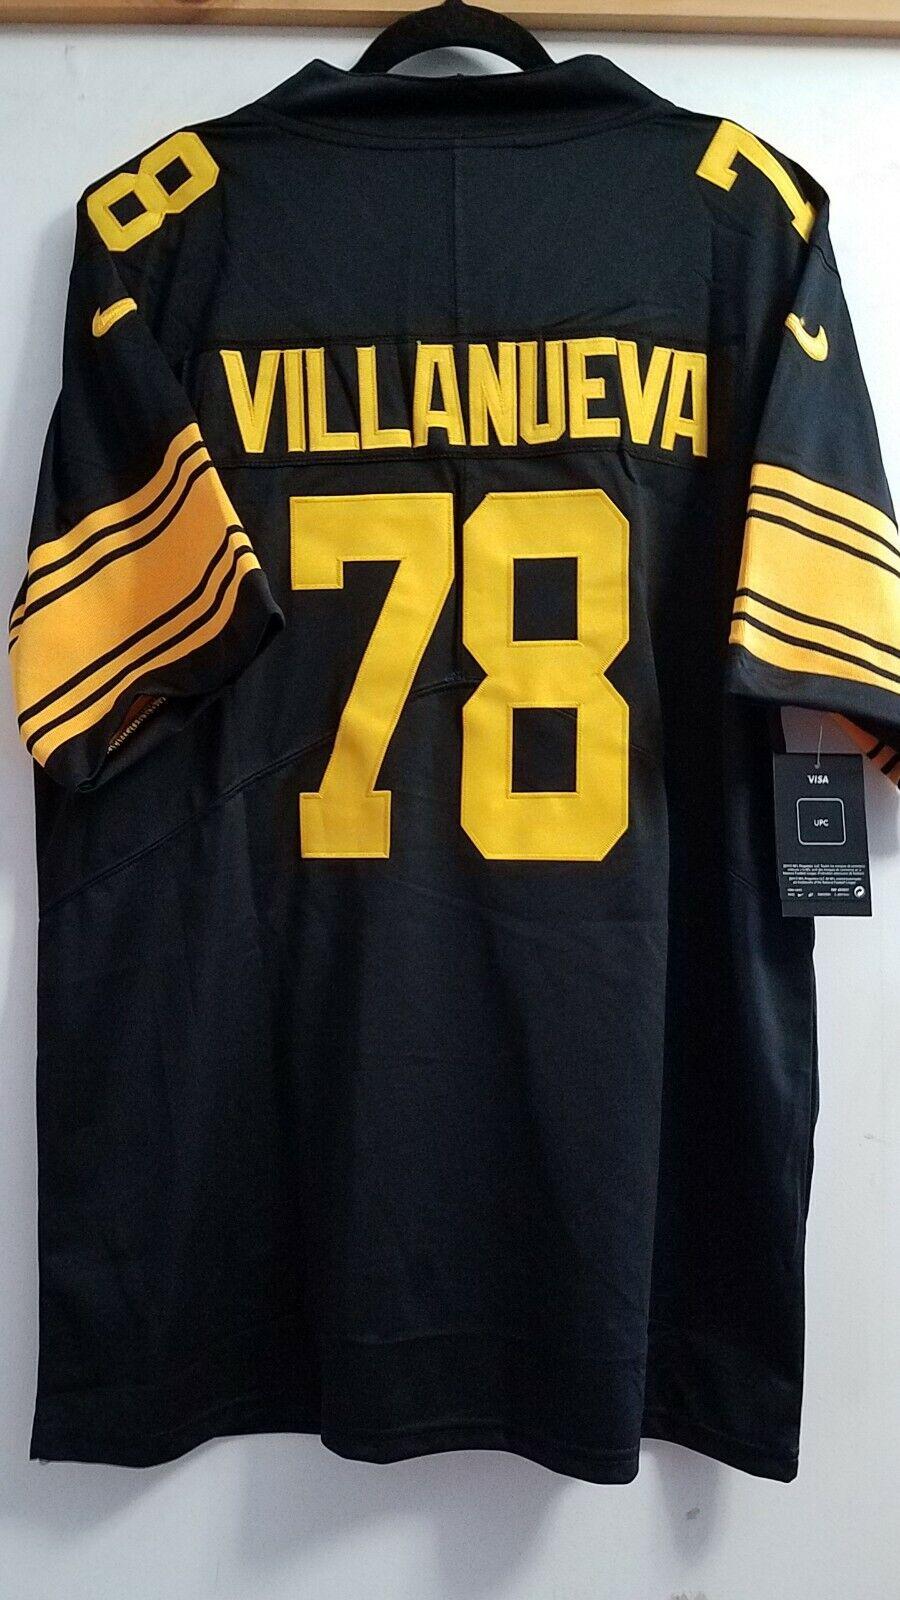 new products 3db66 61727 ALEJANDRO VILLANUEVA Pittsburgh Steelers #78 jersey RUSH ...